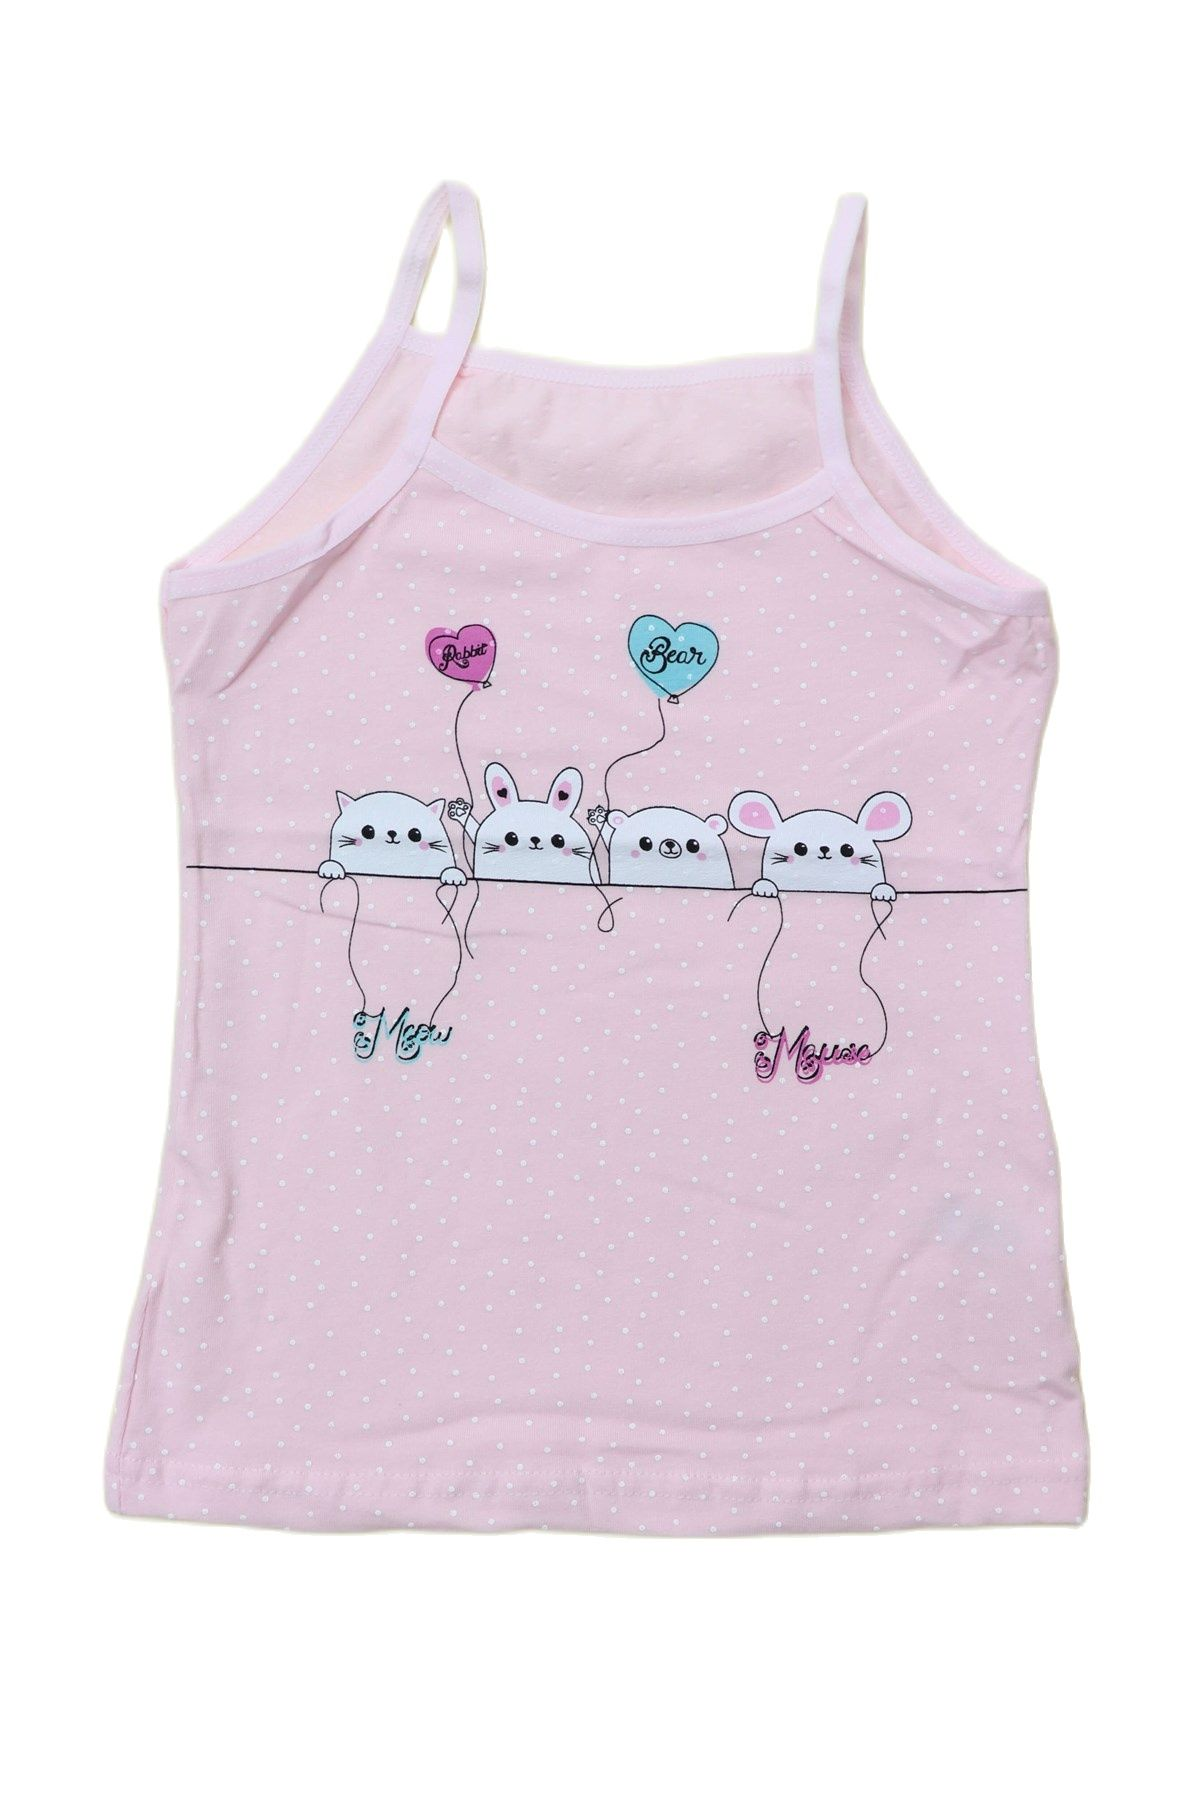 3 Pack 4-14 Year Cotton Girls Undershirt Camisole Tank Top Teenage Children's clothing Kids Underwear Singlet Sleeveless